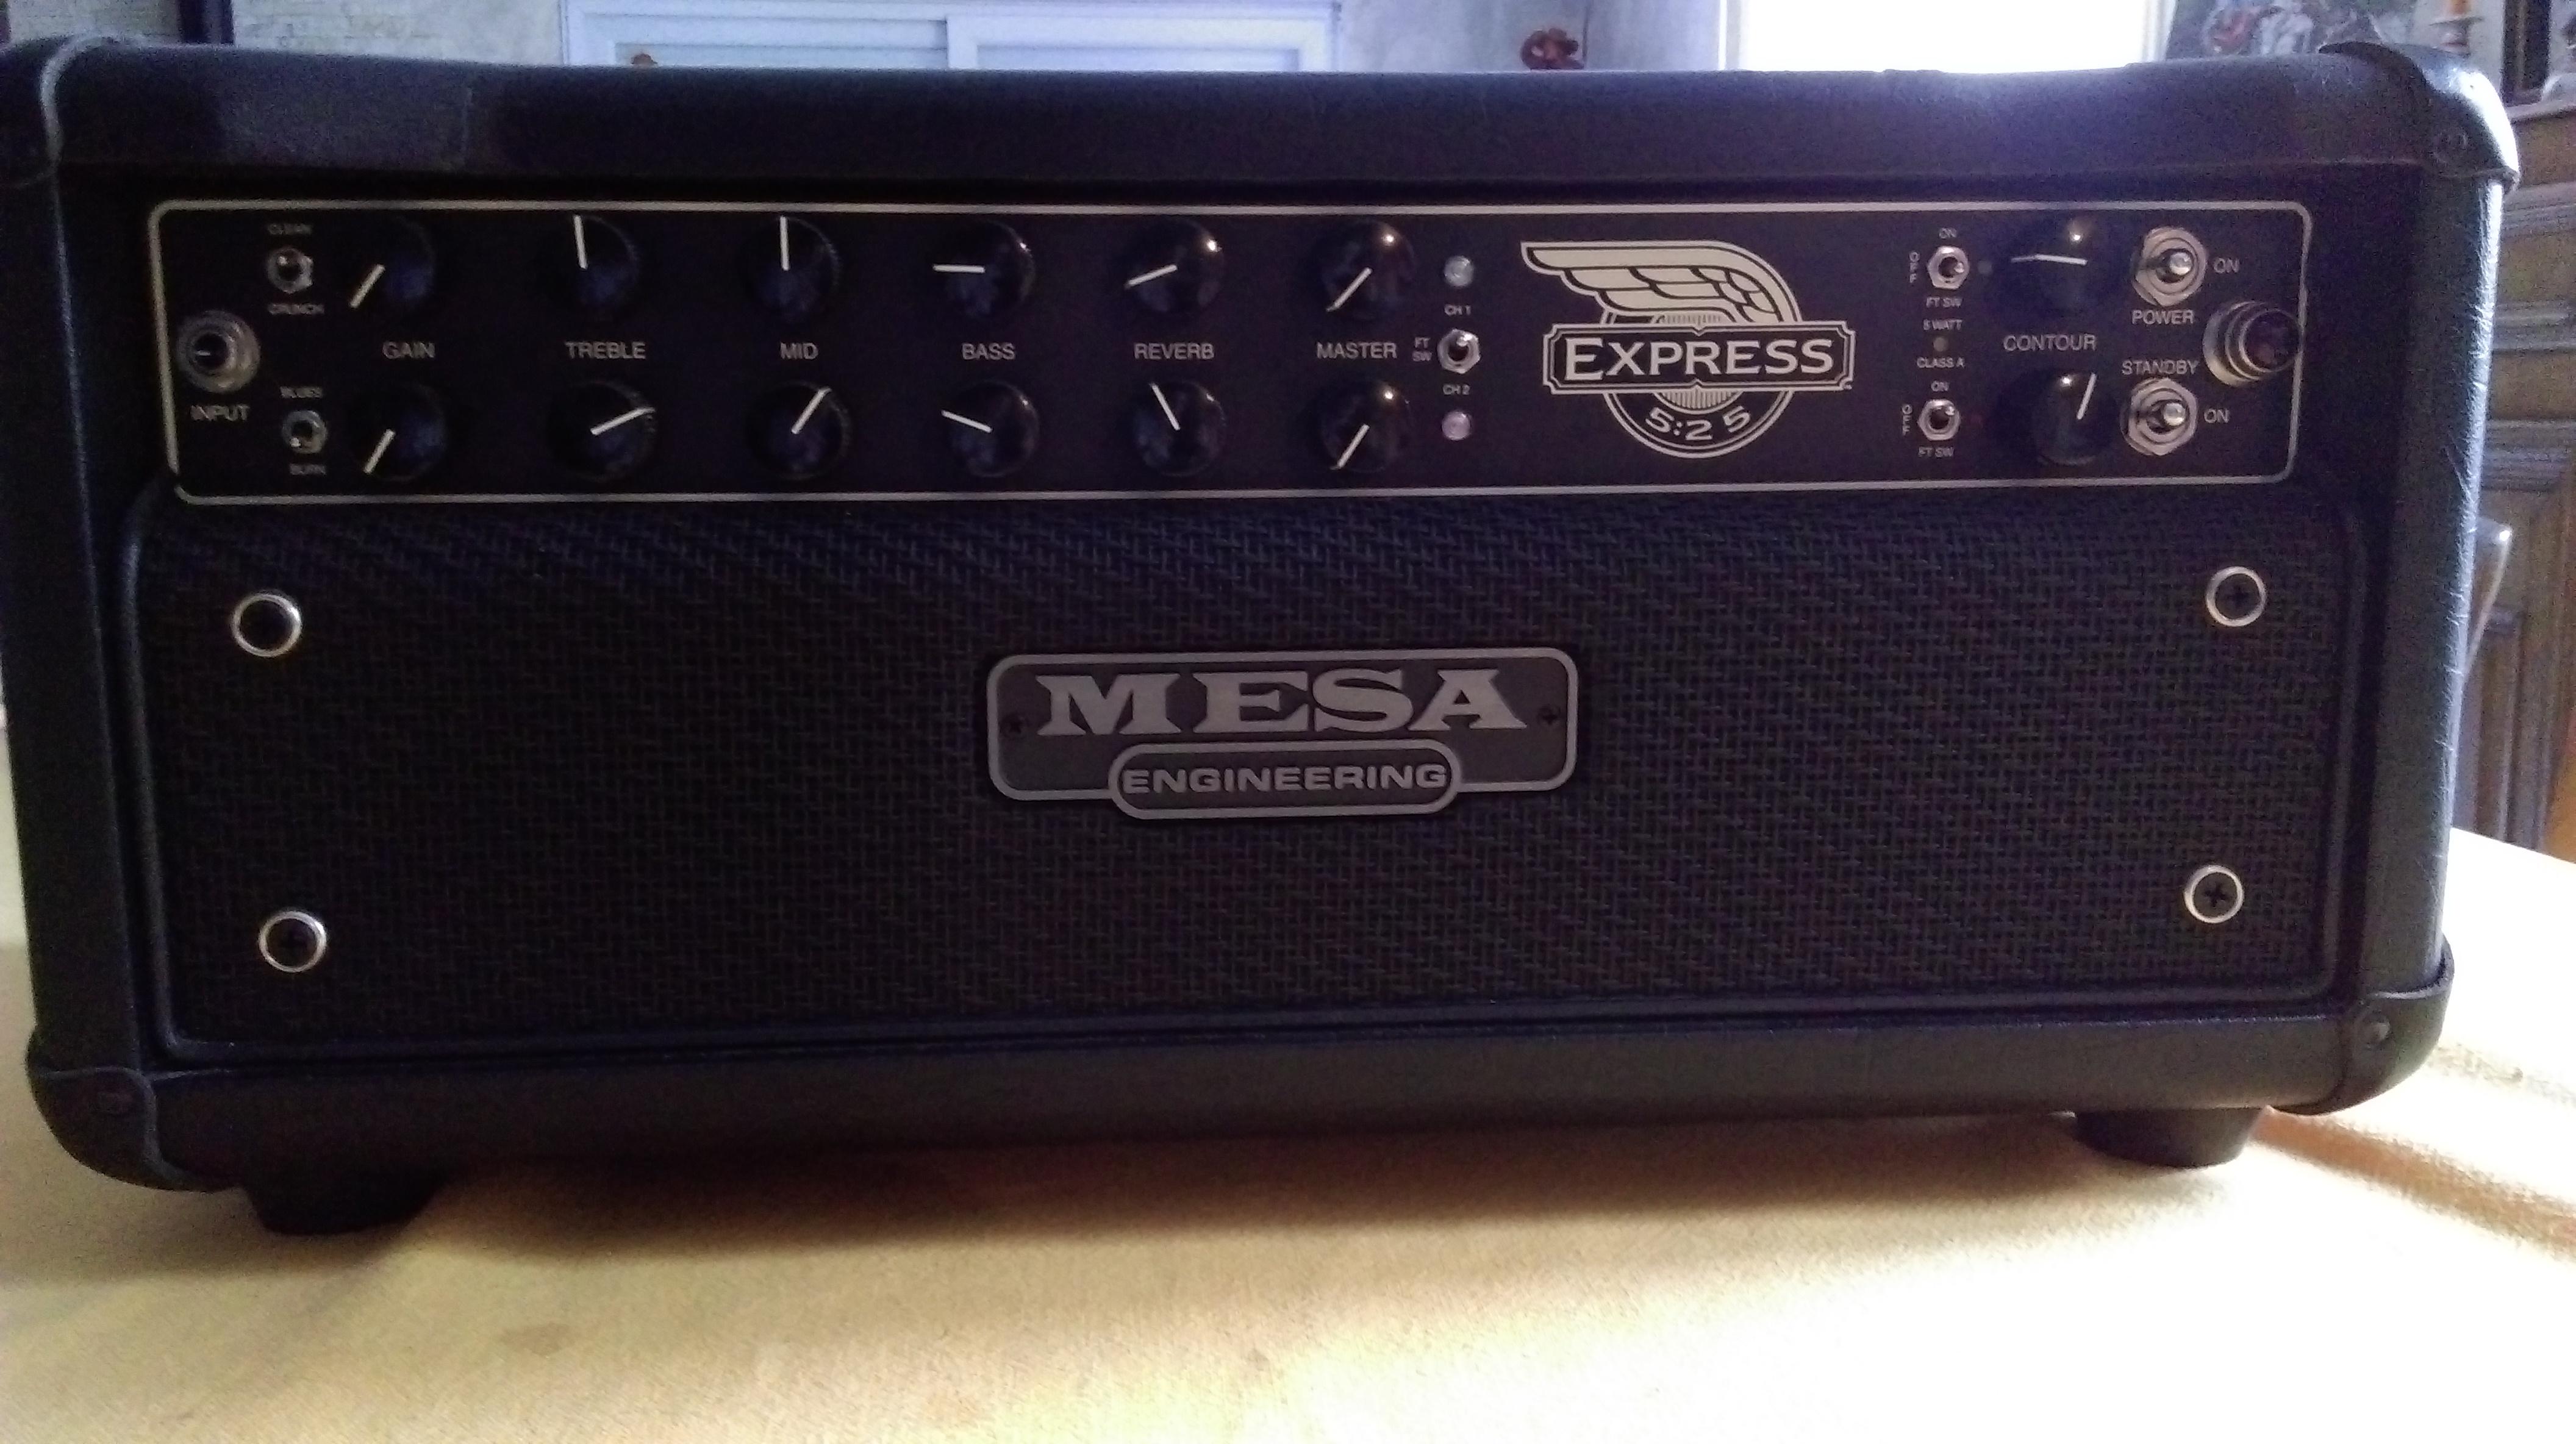 Mesa boogie express 5 25 head image 1481145 audiofanzine for Mesa boogie express 5 25